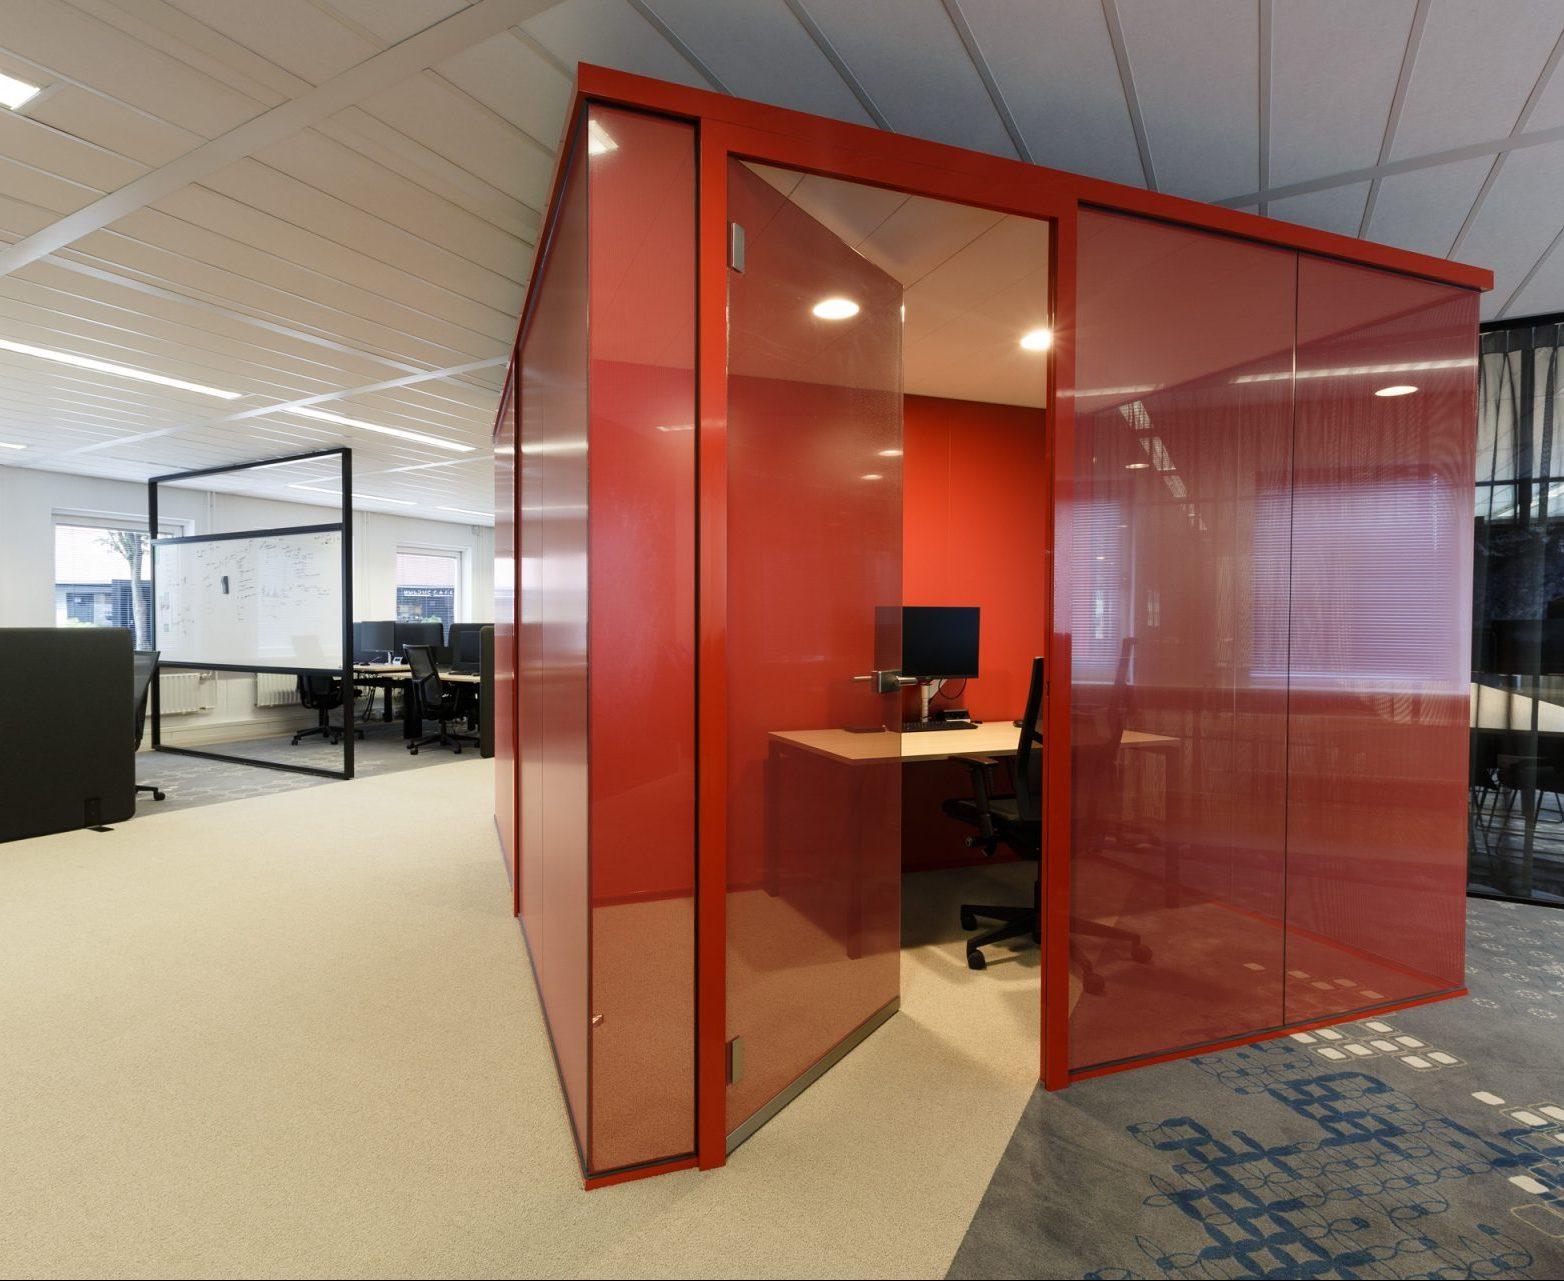 RubiX s-Hertogenbosch - Topperprojecten 4